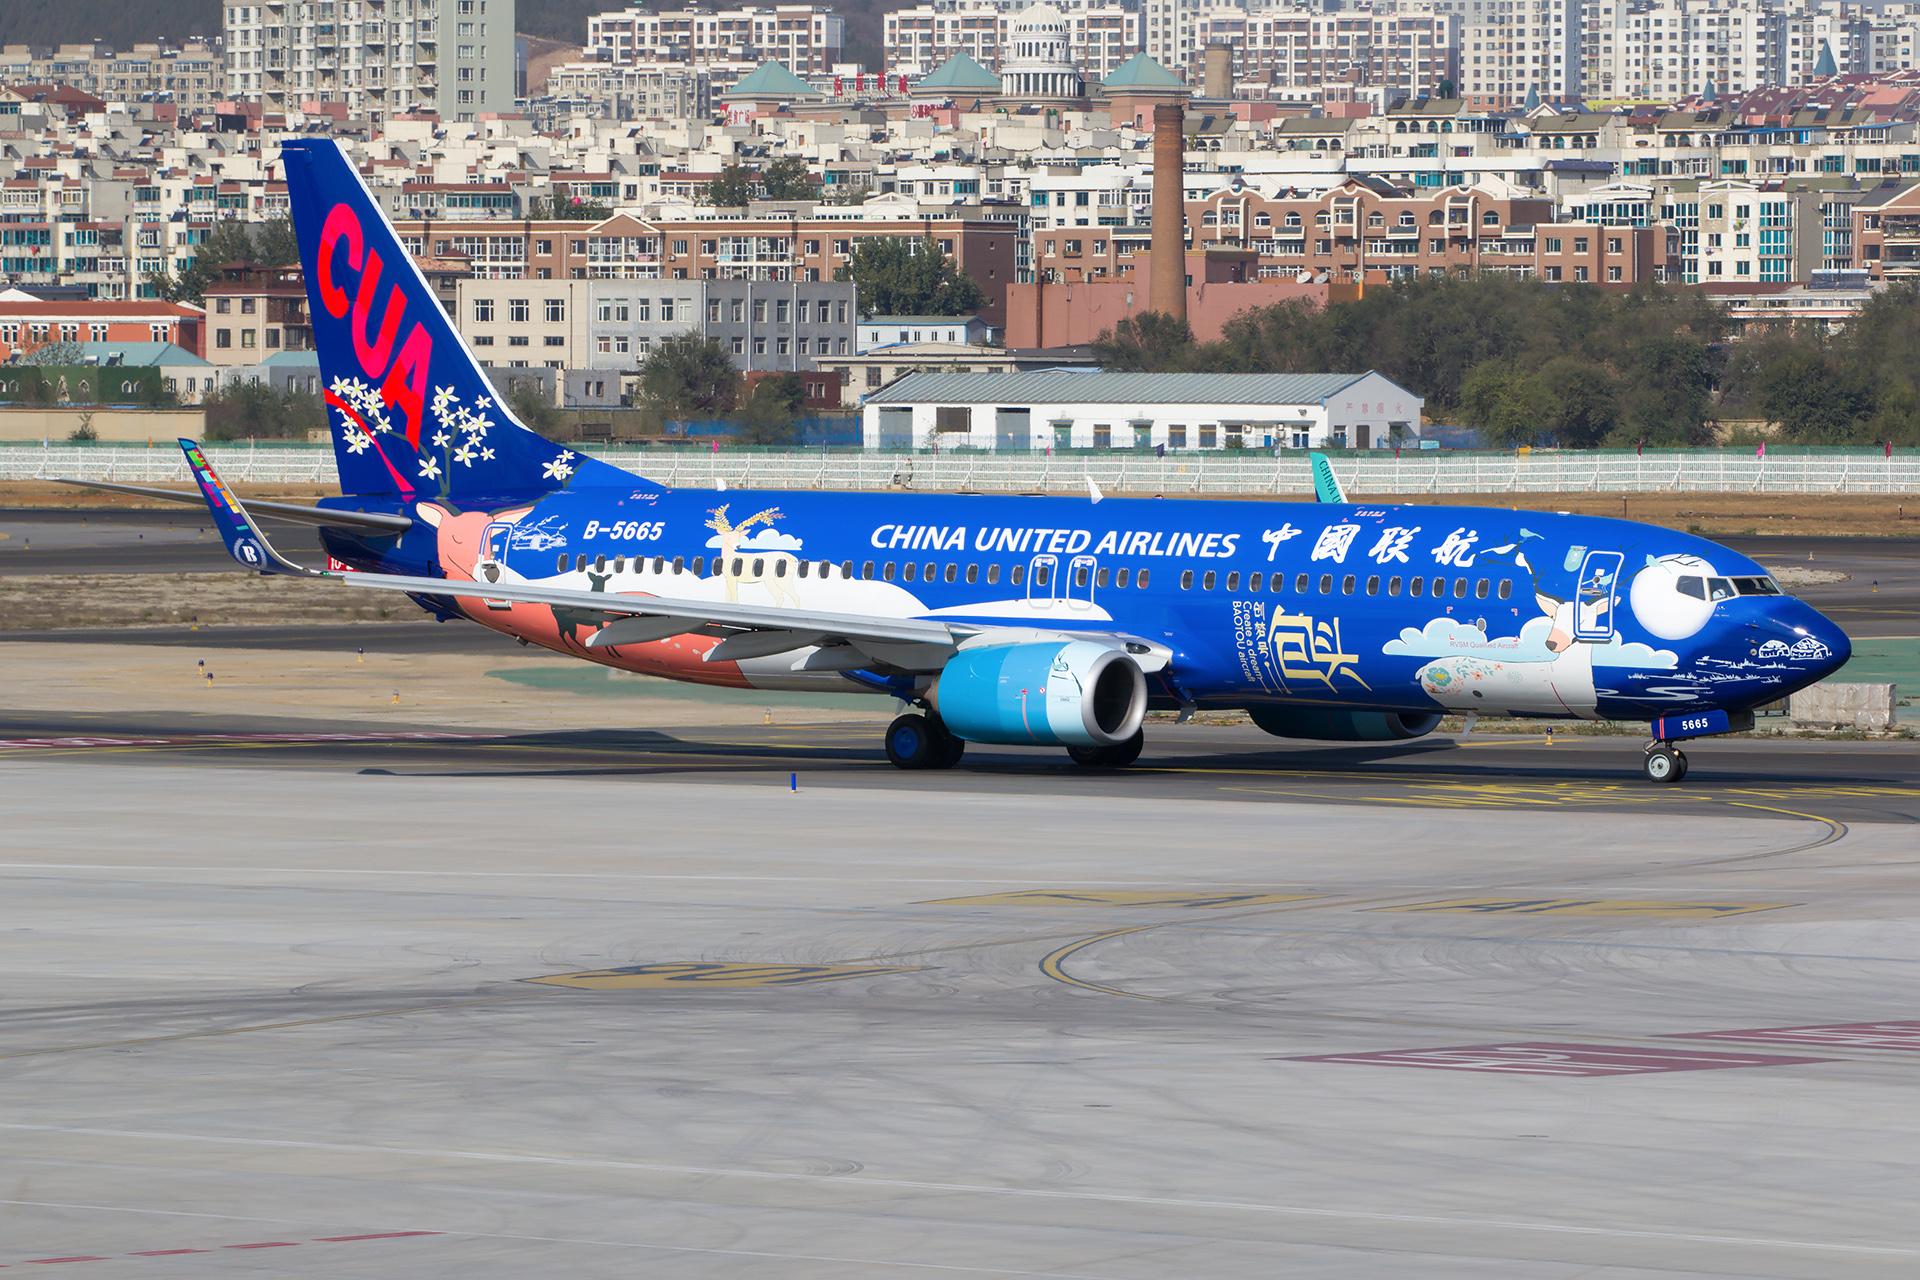 Re:[原创][DLC]。。。中国联航-包头创梦号。。。 BOEING 737-800 B-5665 中国大连国际机场